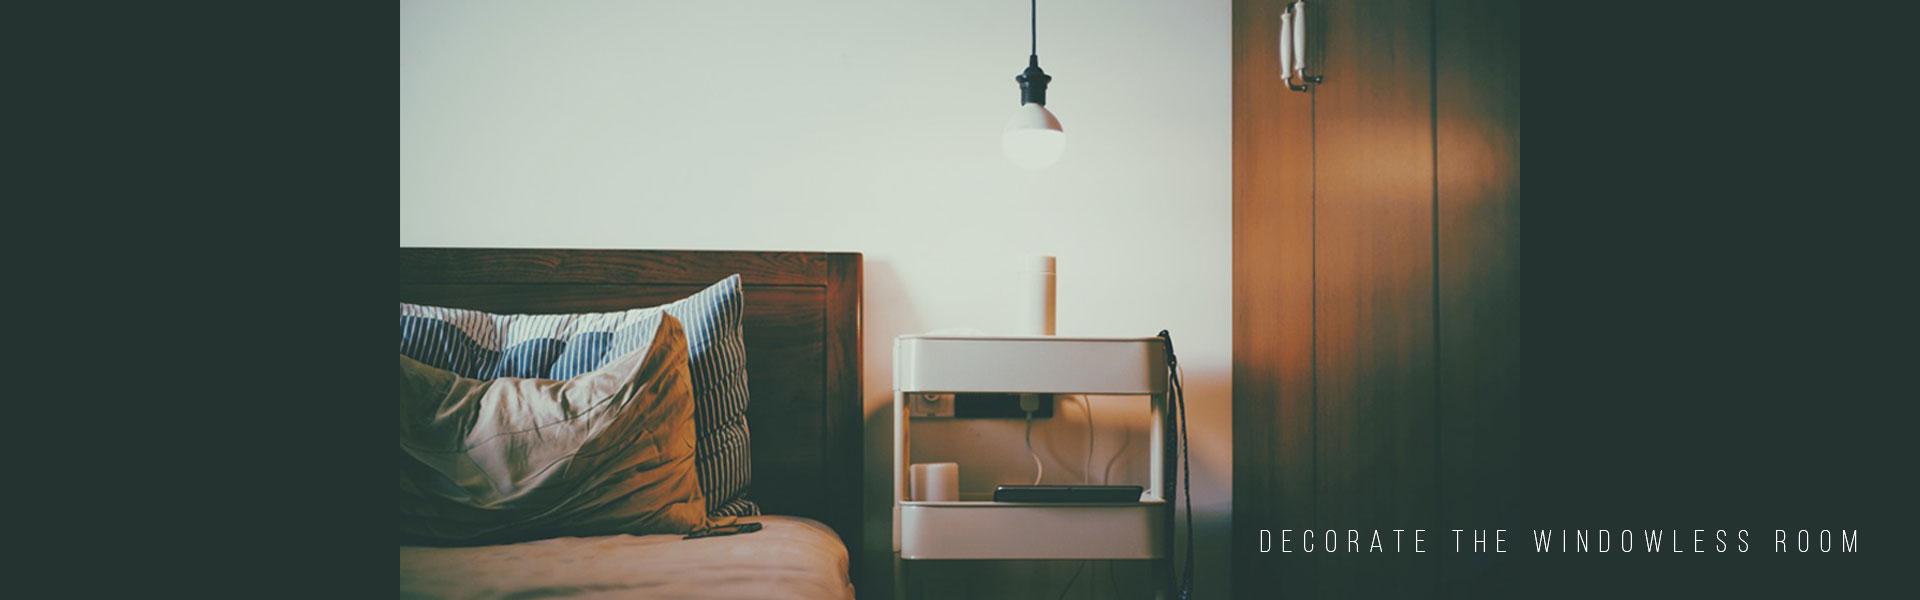 decorasion windowless room1 - چگونه یک اتاق بدون پنجره را تزئین کنیم